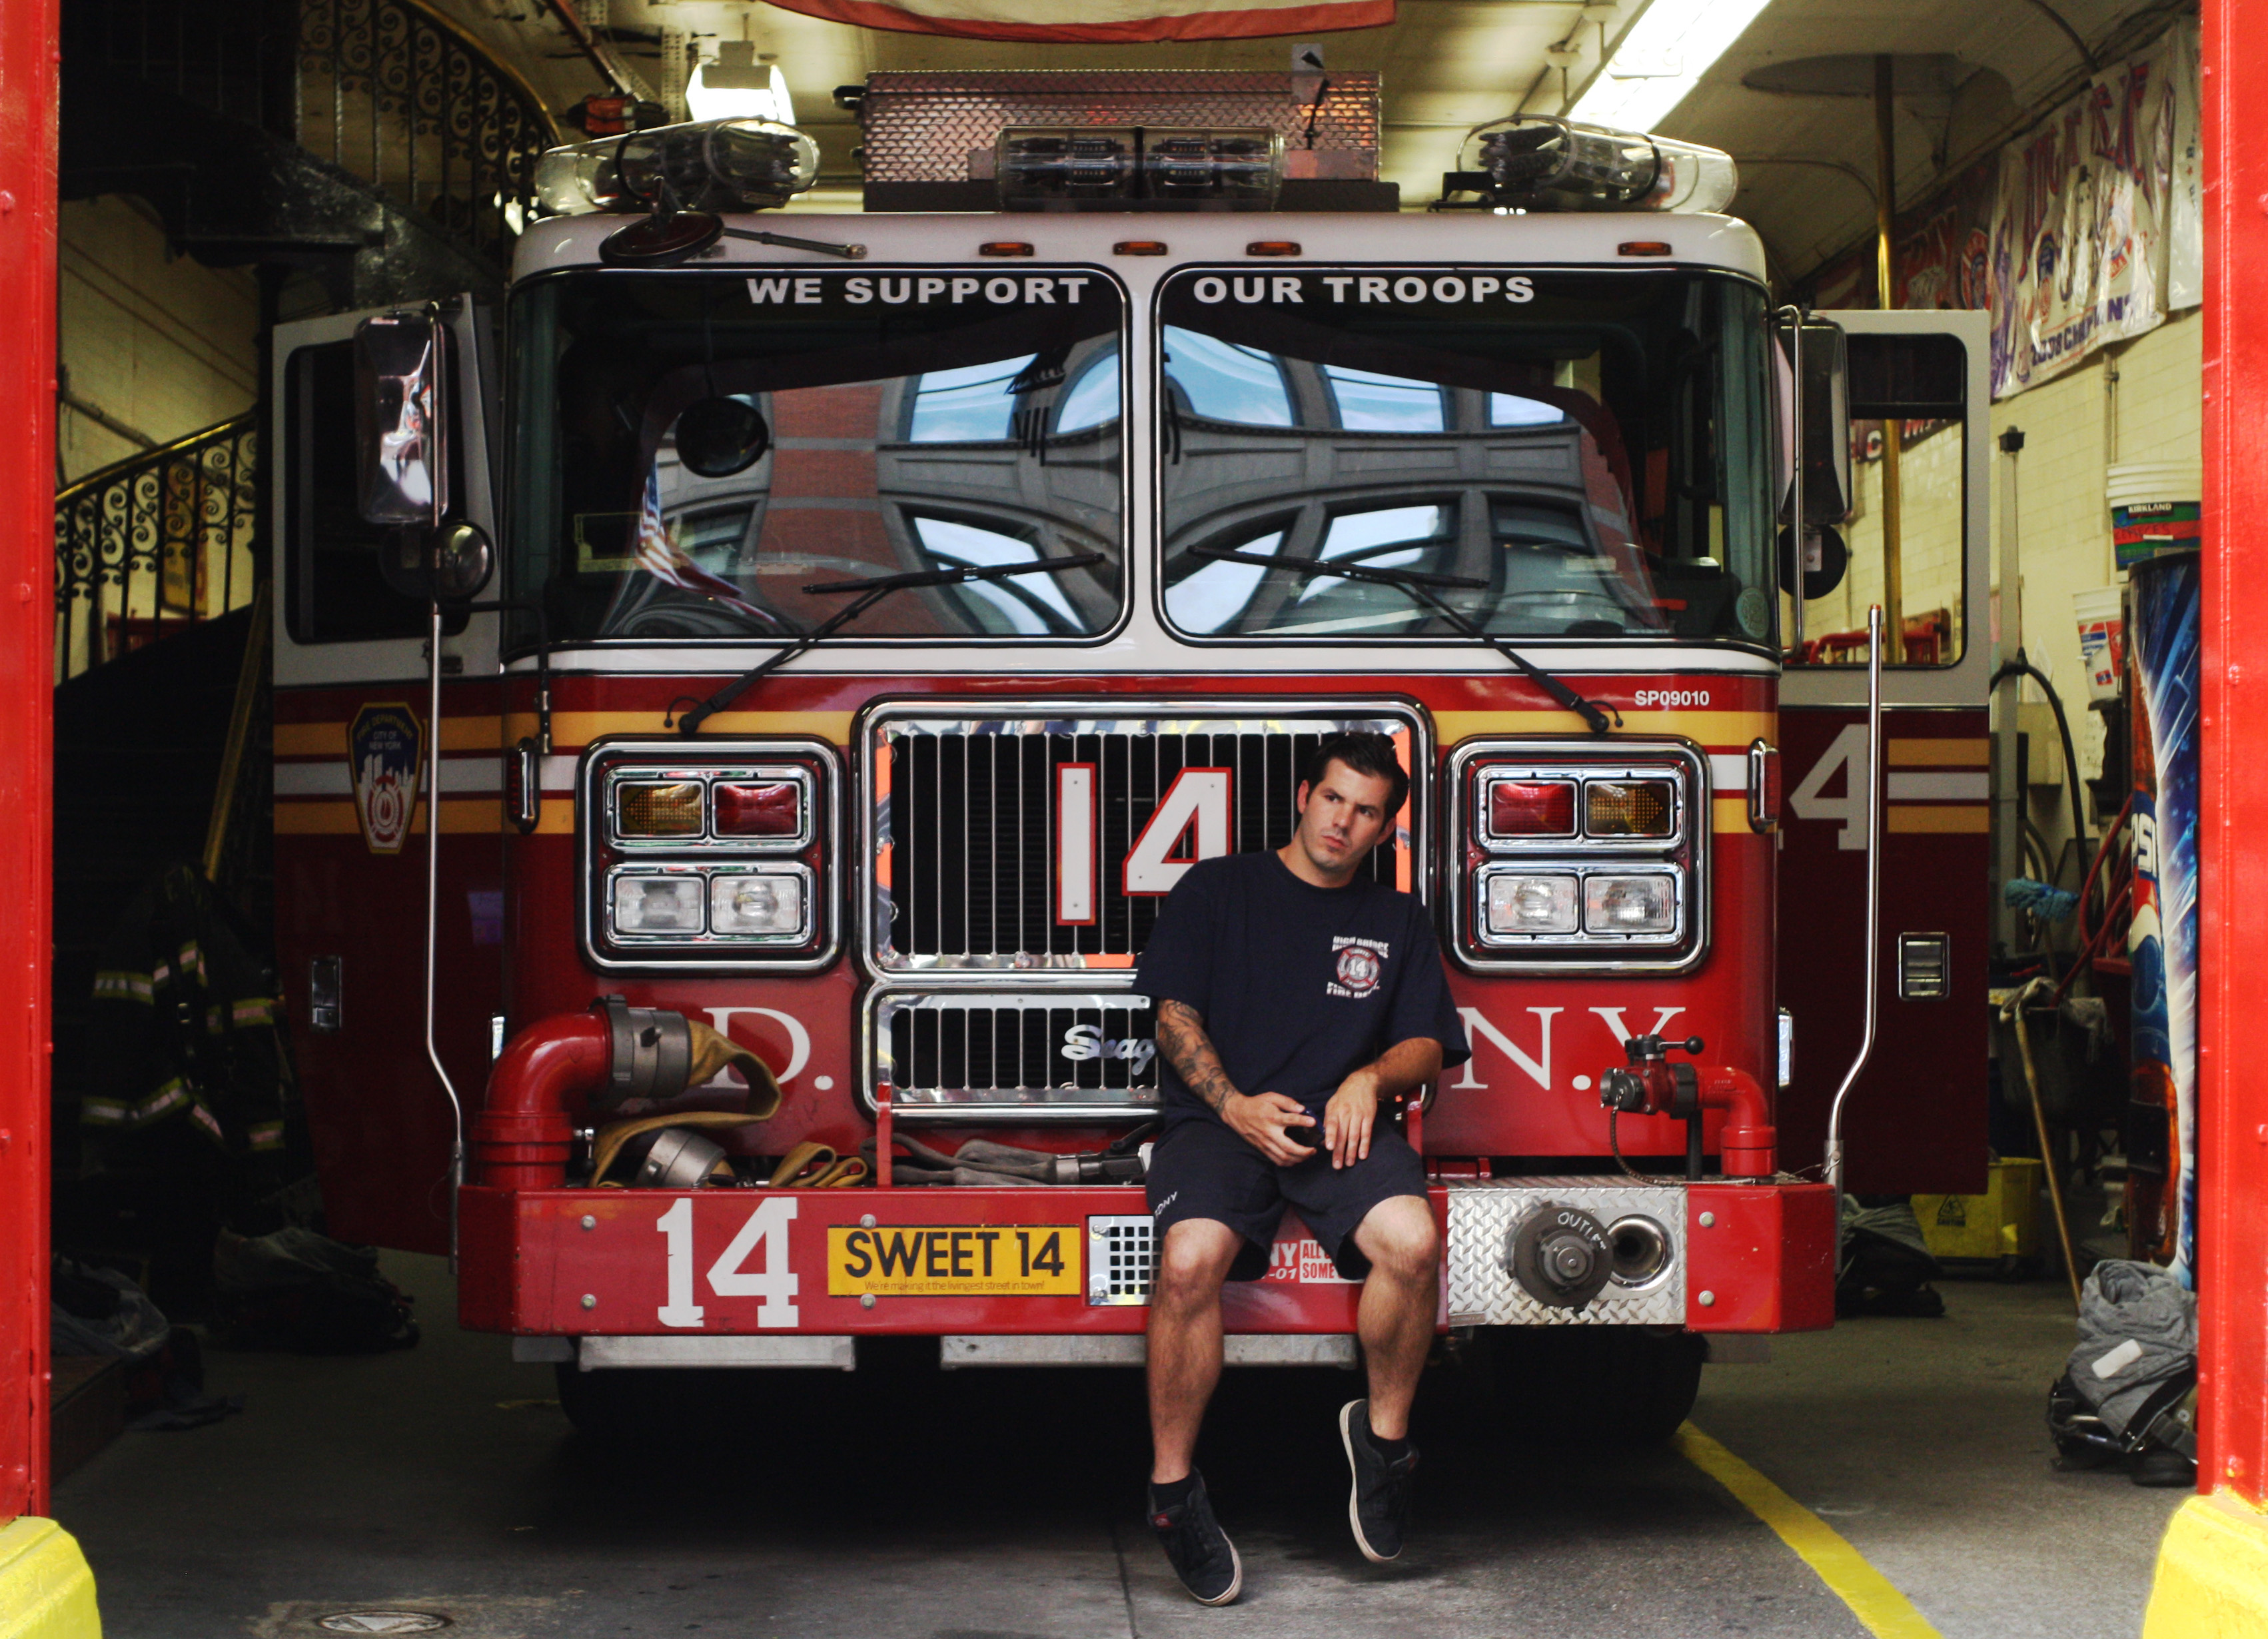 1 fireman